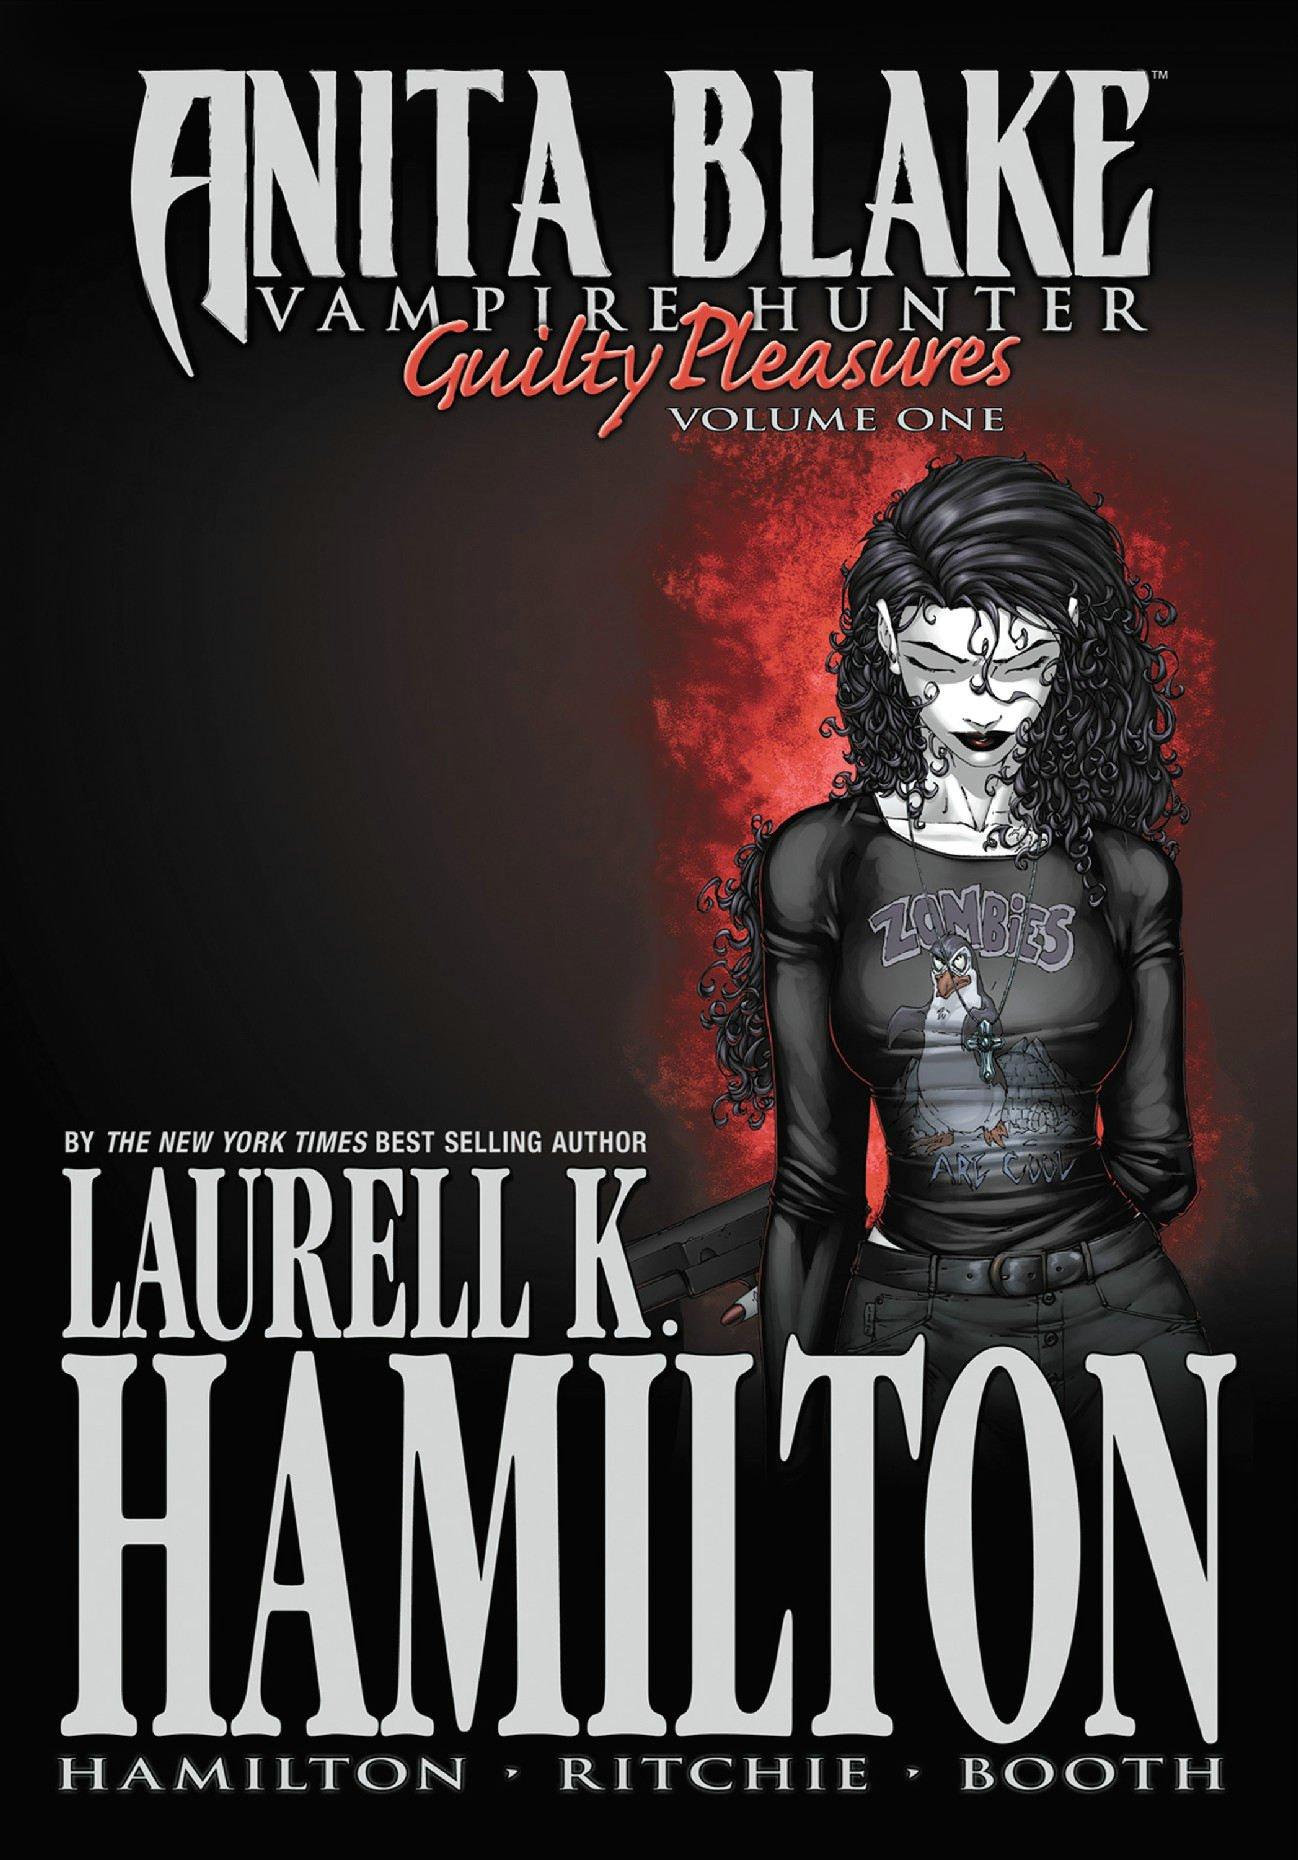 Read Online Anita Blake, Vampire Hunter: Guilty Pleasures, Vol. 1 (Graphic Novel) pdf